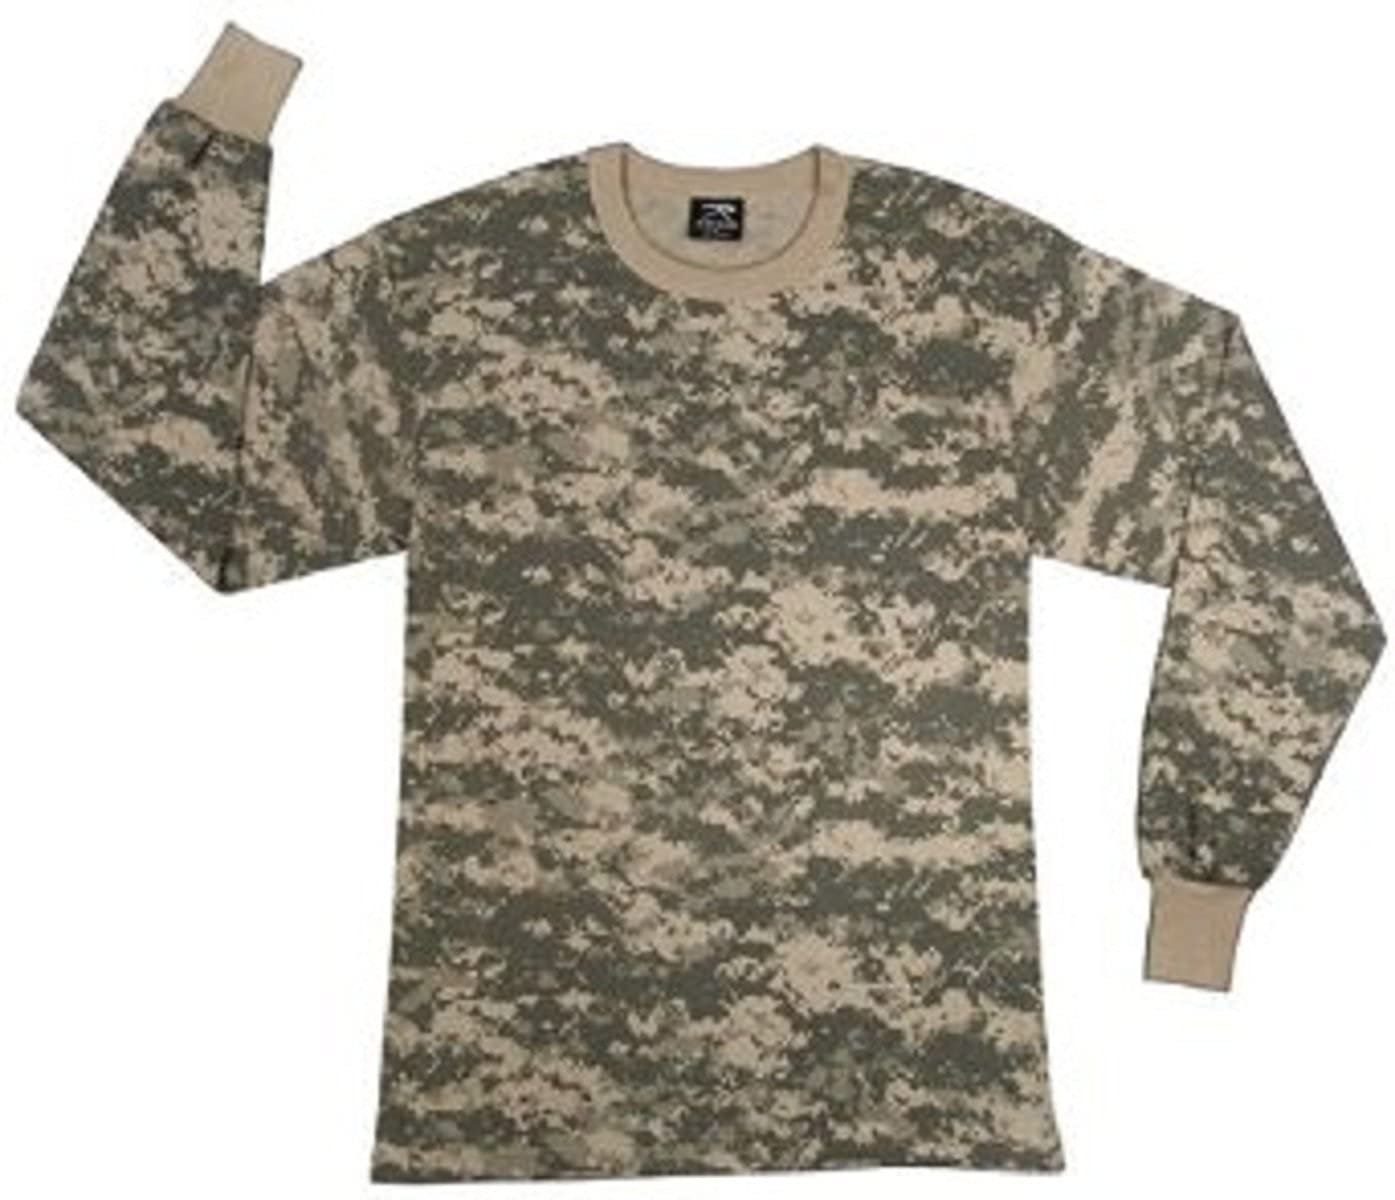 Amazon.com  Army Universe ACU Digital Camouflage Boys Long Sleeve T-Shirt  (Large)  Military Apparel Shirts  Clothing e7ed6b3875a